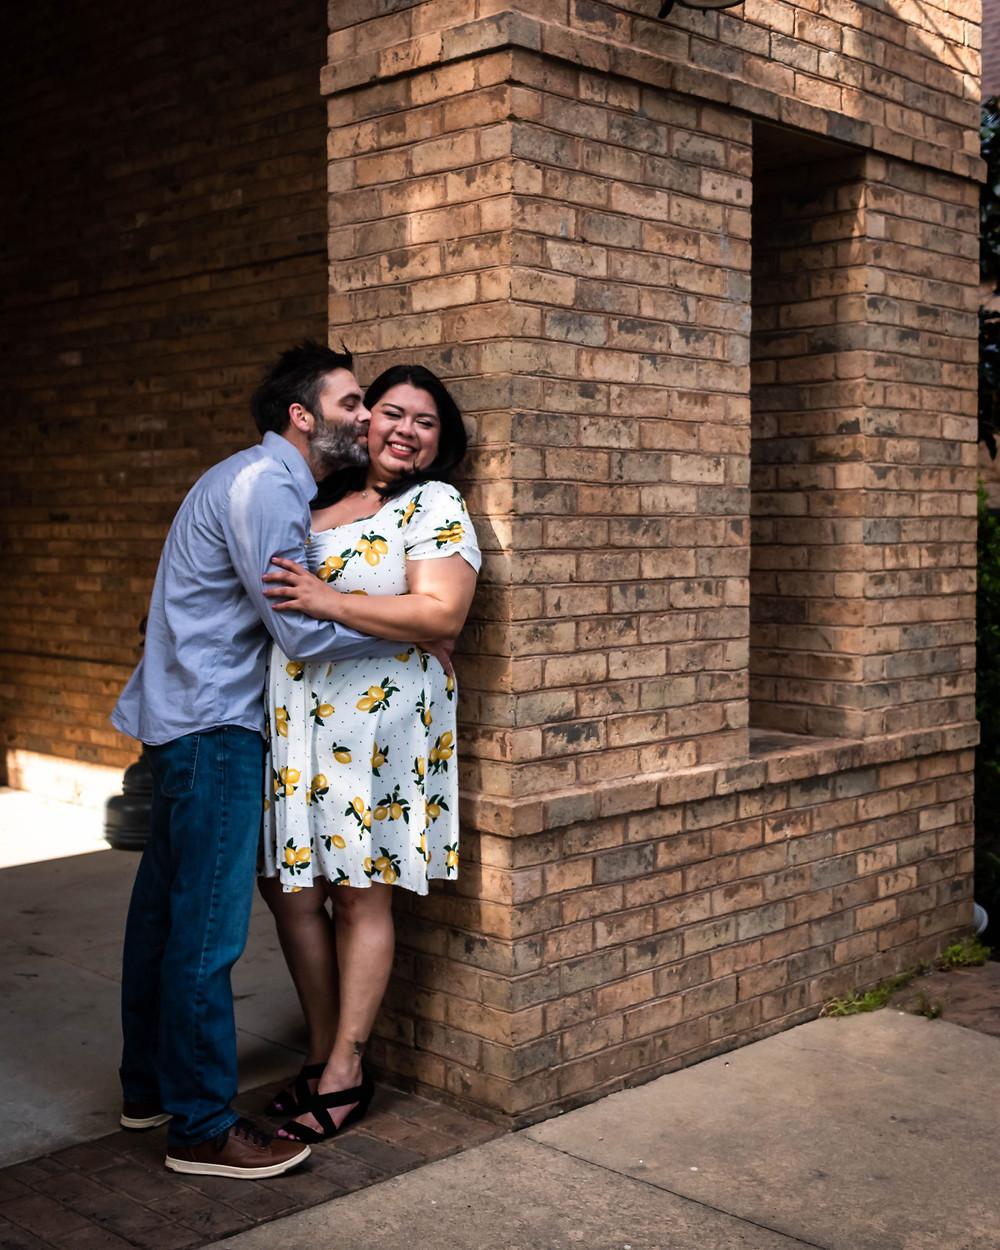 Cute man kisses girl at historic church in downtown Murfreesboro